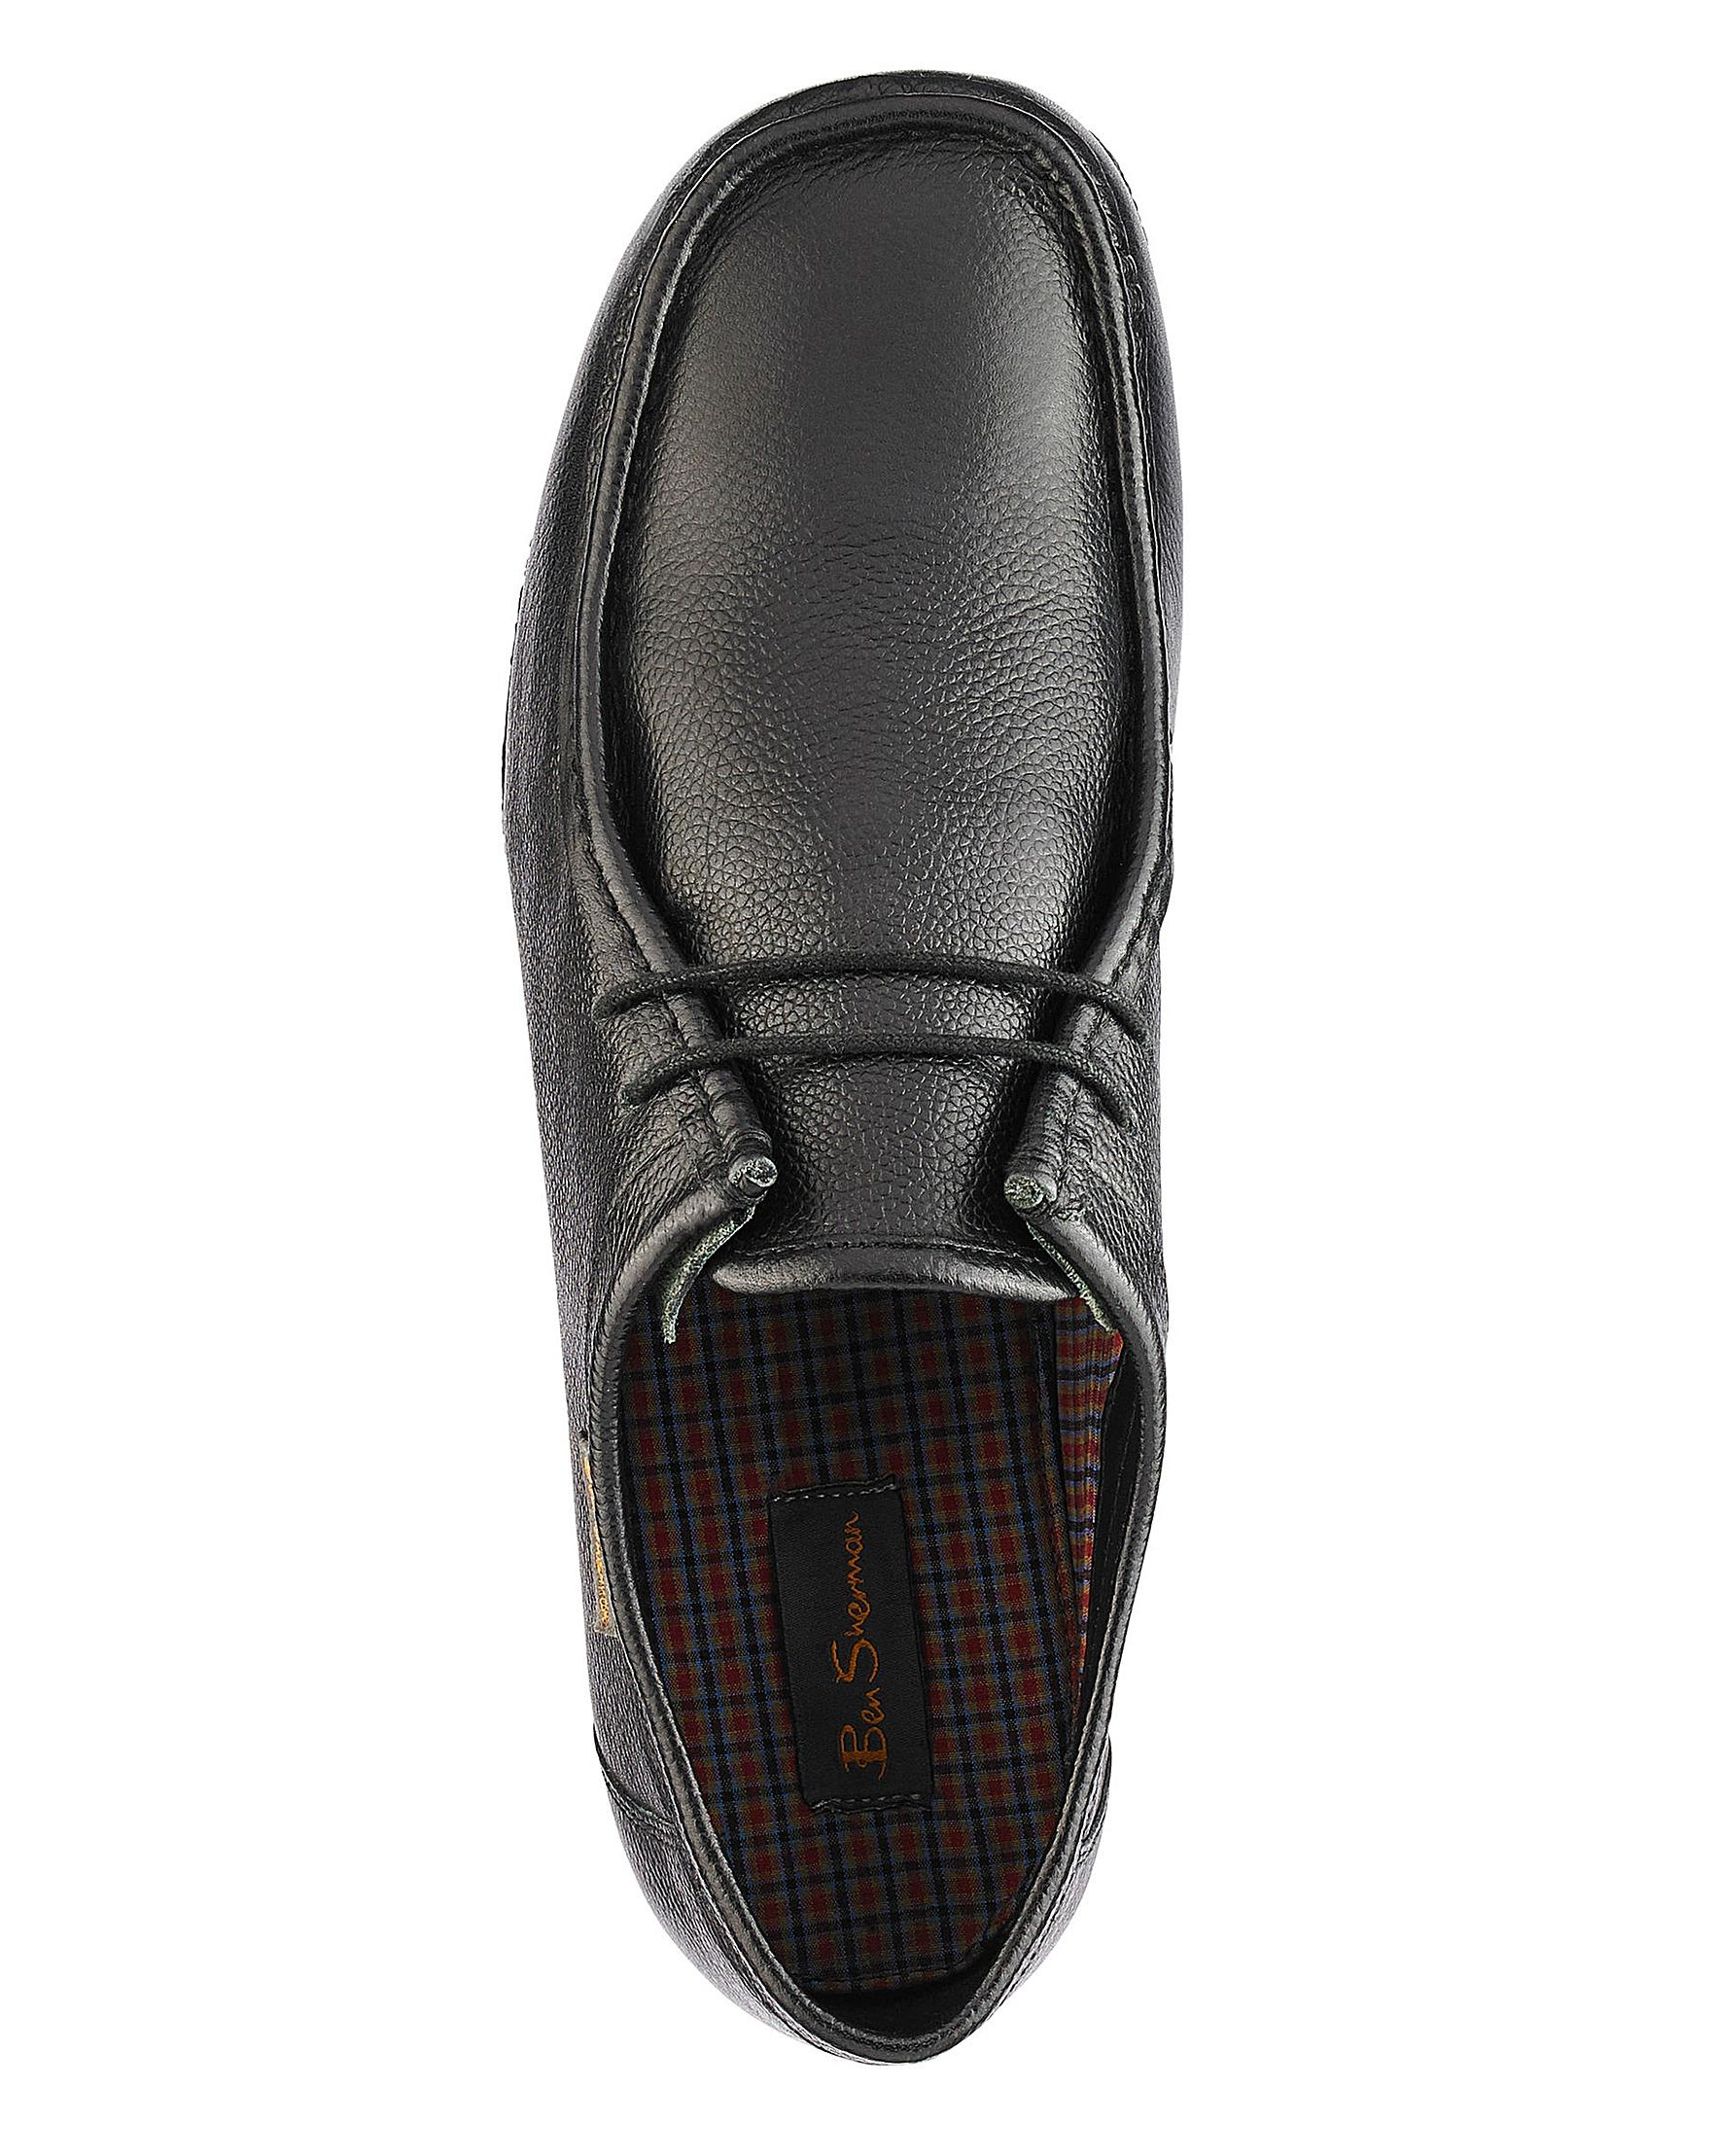 6184bd582d Ben Sherman - Black Quad Wallabee Wide Fit for Men - Lyst. View fullscreen